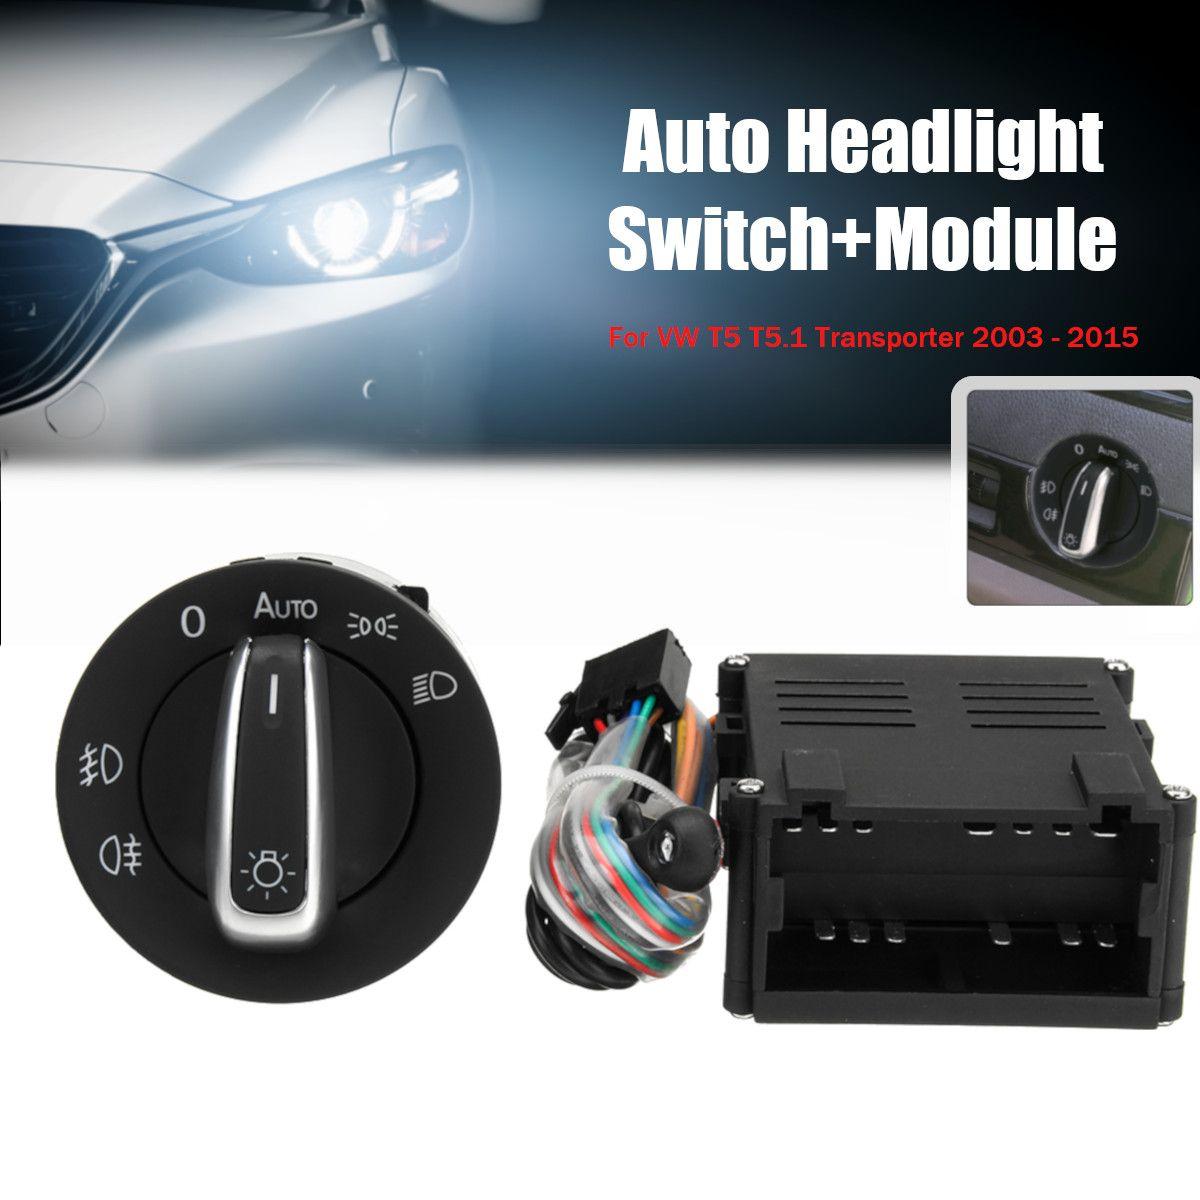 Car Auto Headlight Sensor HeadLamp Switch + Control Module for VW T5 T5.1 Transporter 2003-2015